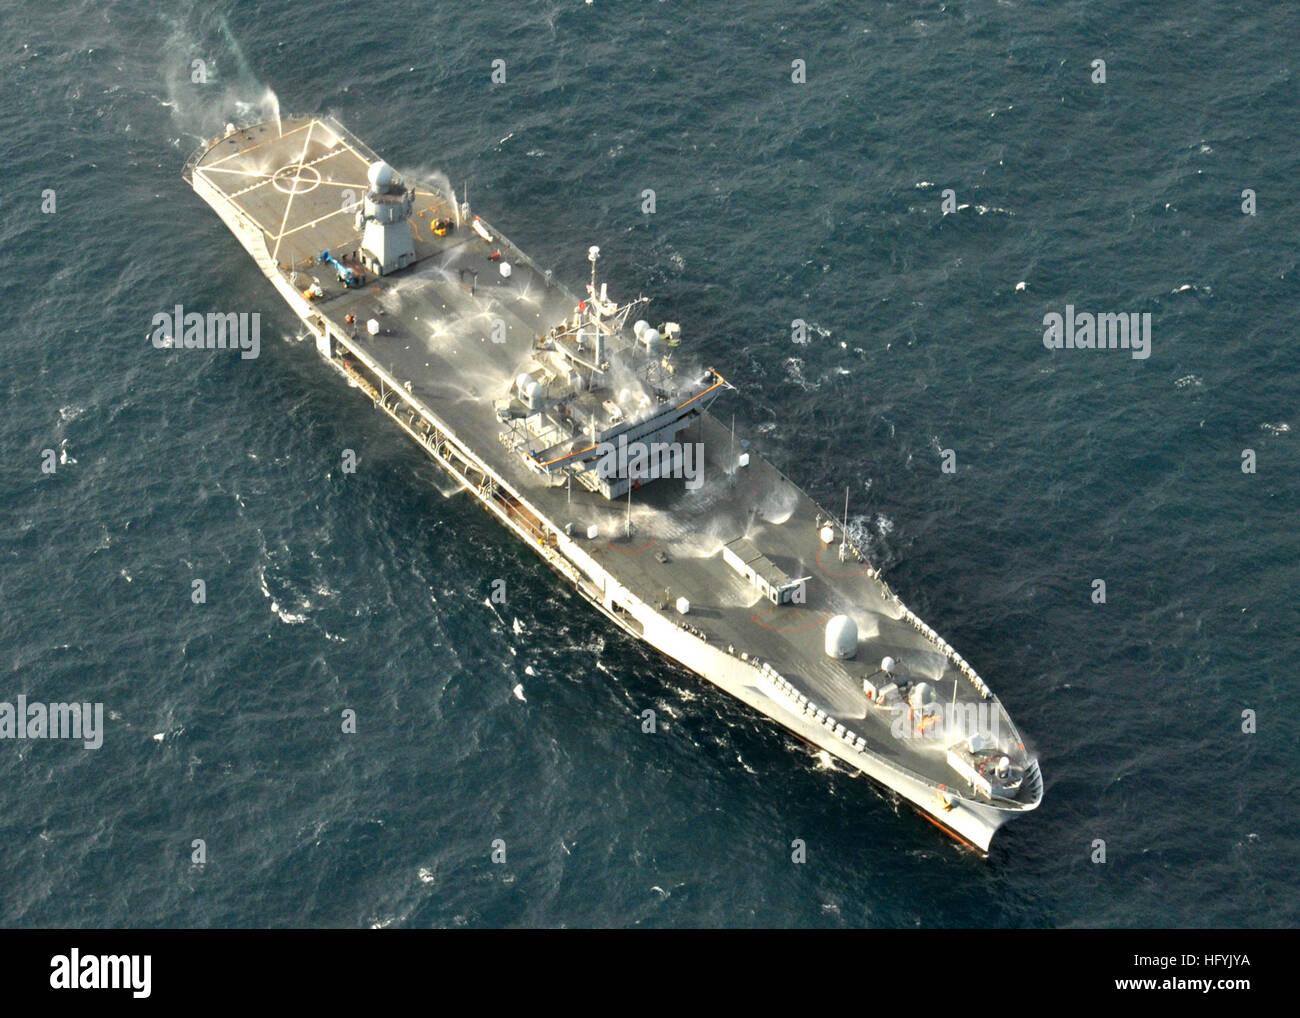 The amphibious command ship USS Mount Whitney (LCC/JCC 20) test of the ship's salt water countermeasure wash - Stock Image